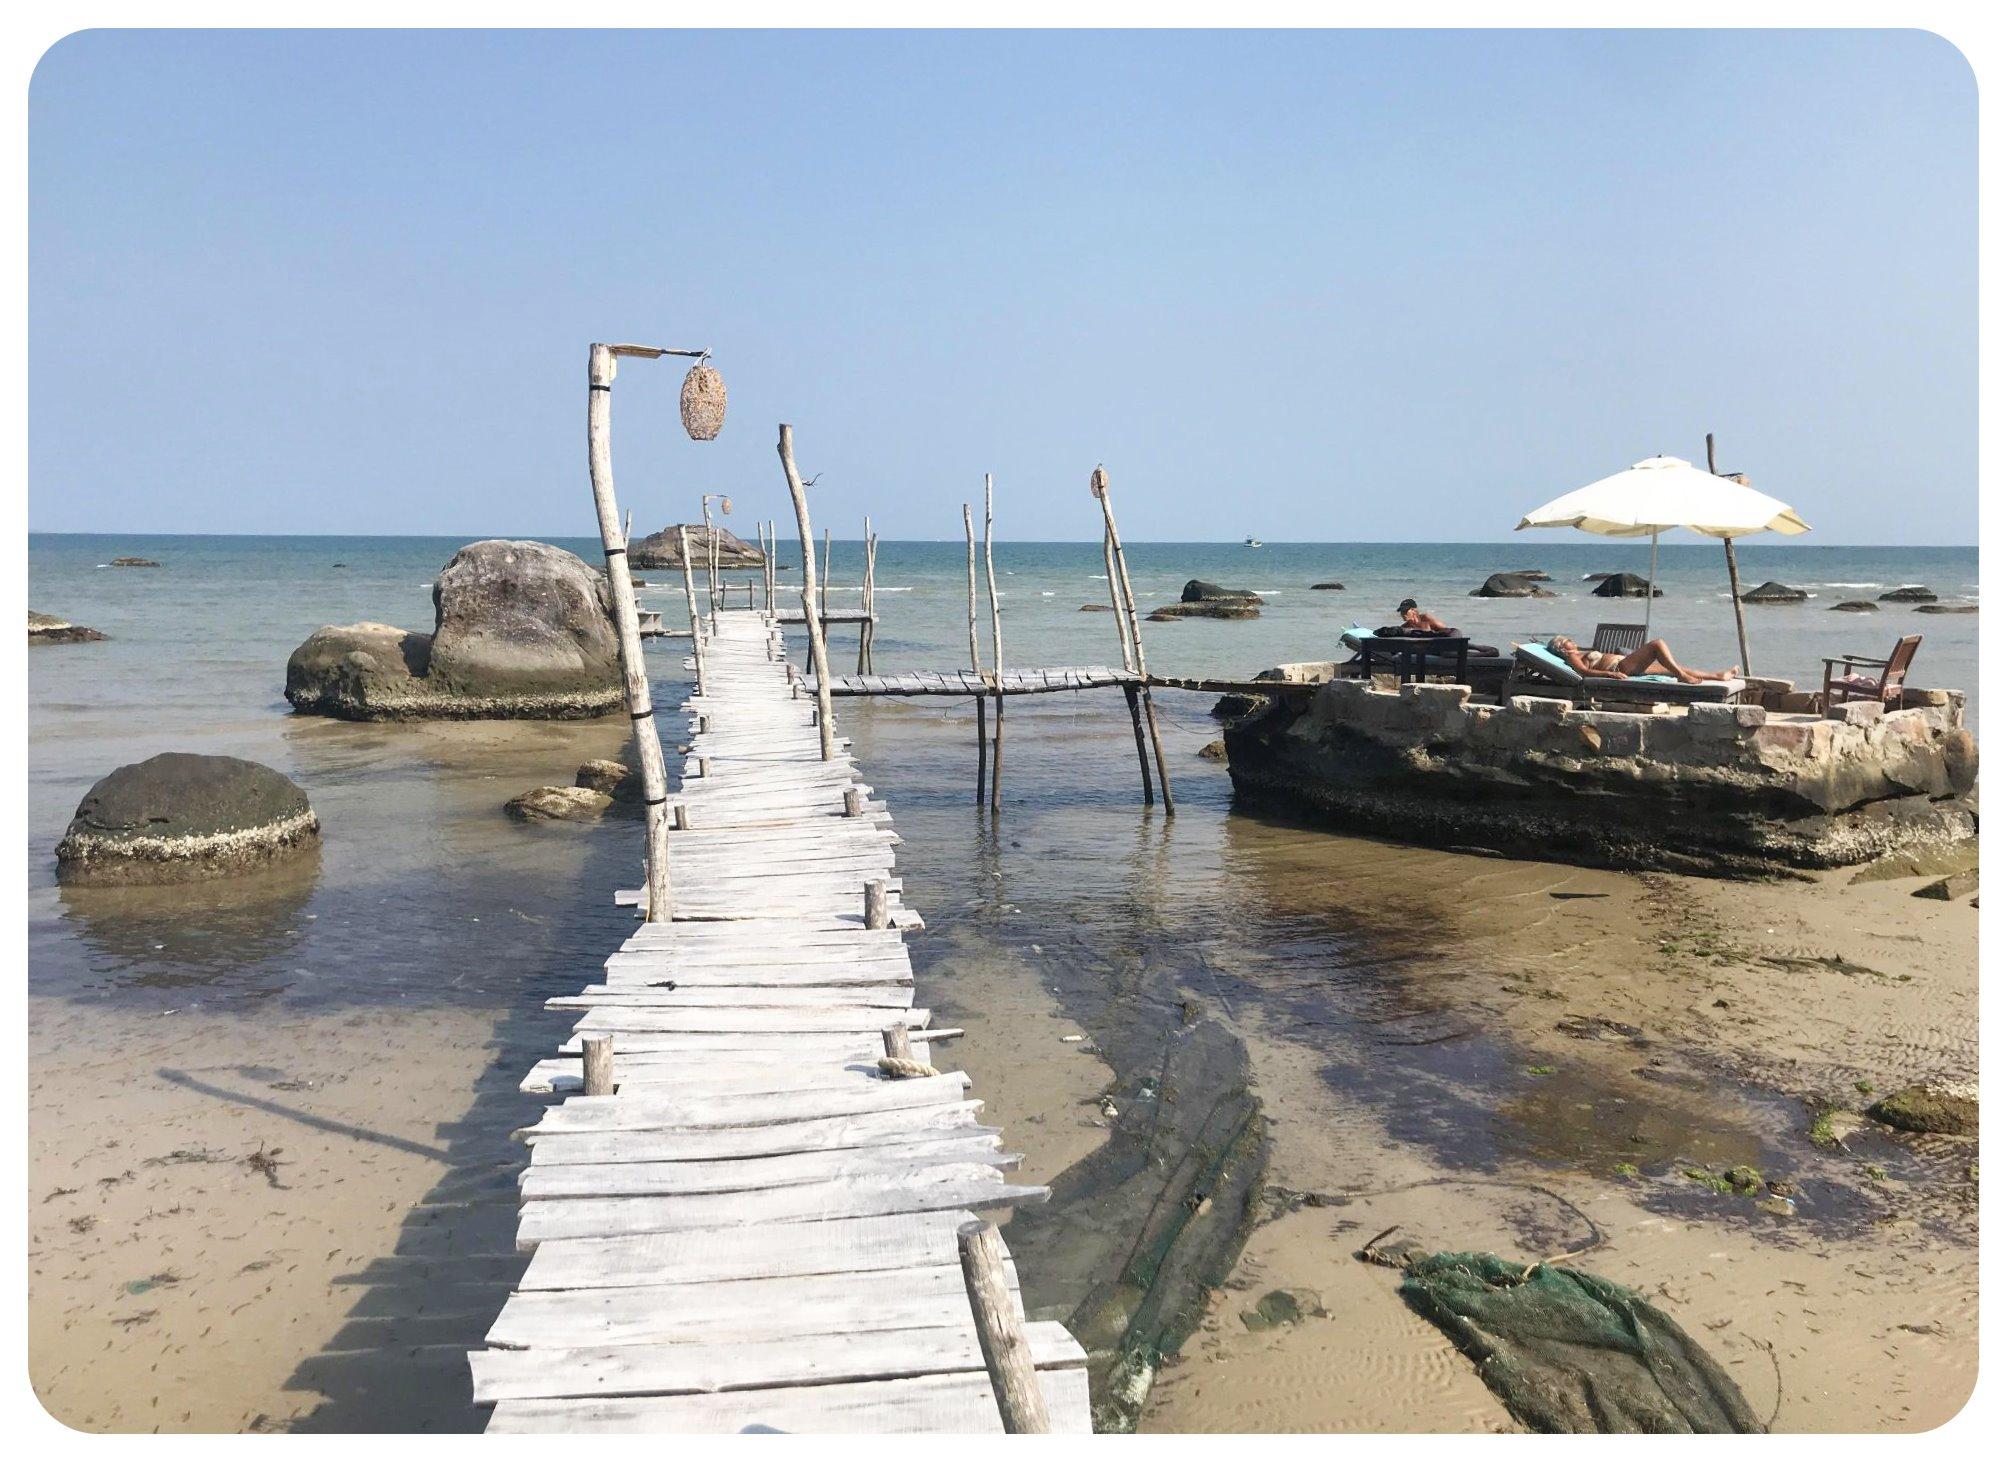 phu quoc resort pier